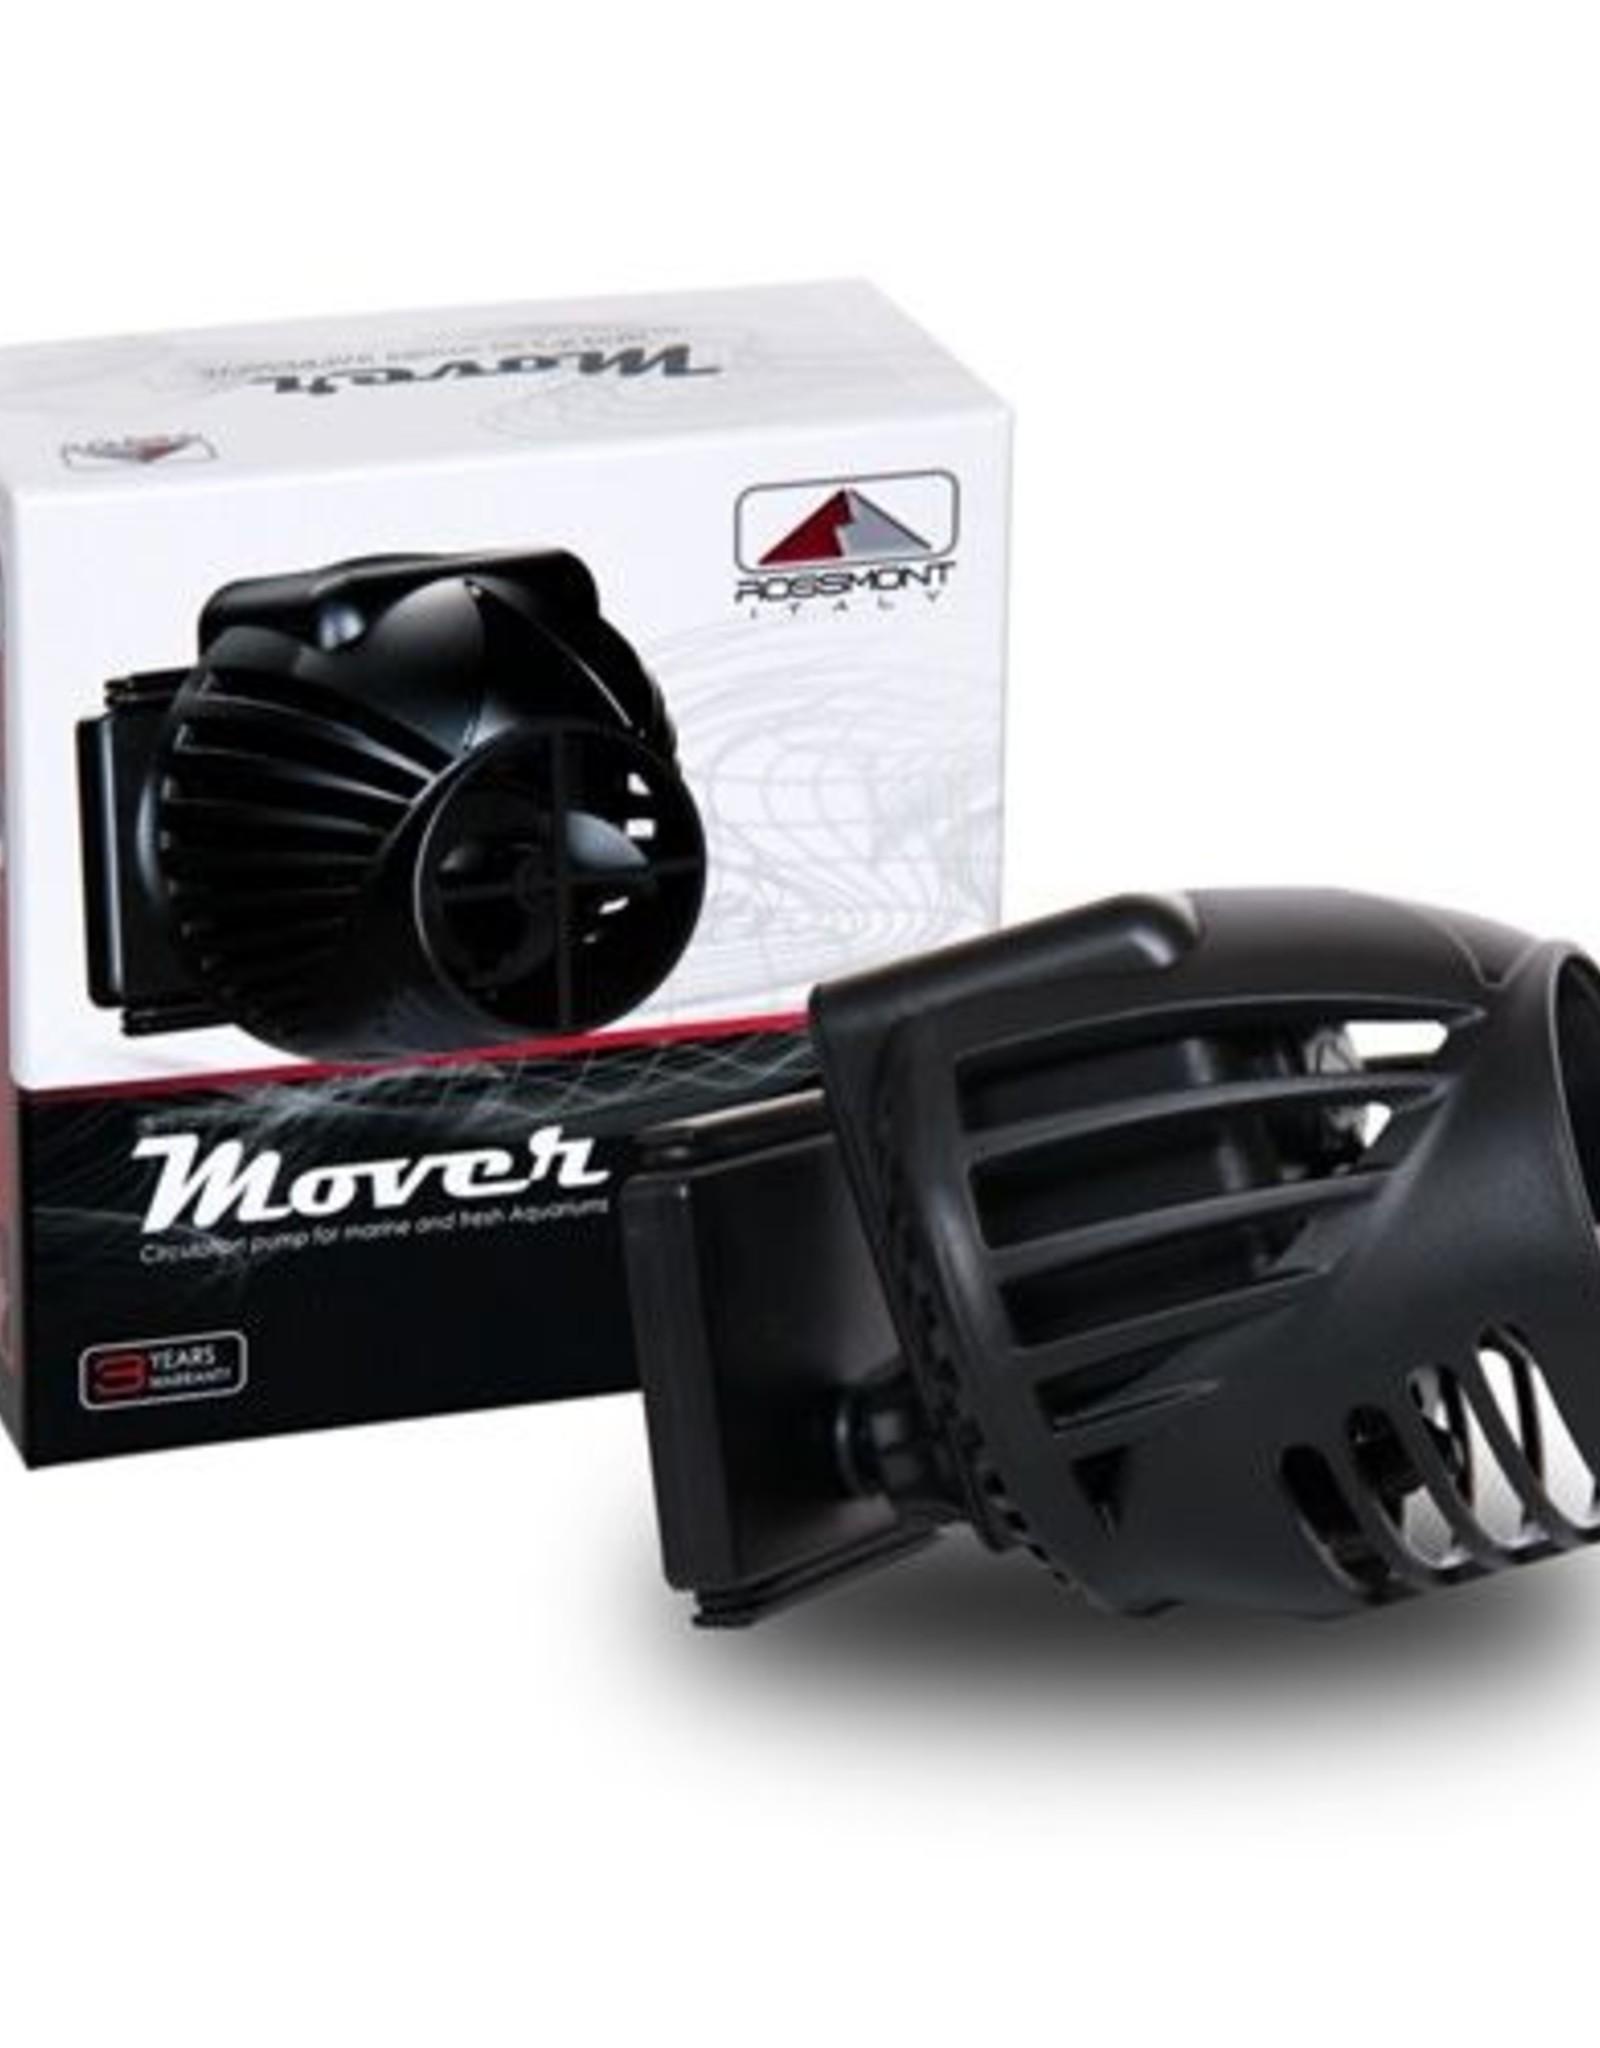 ROSSMONT MOVER MX2600 PUMP 2600GPH